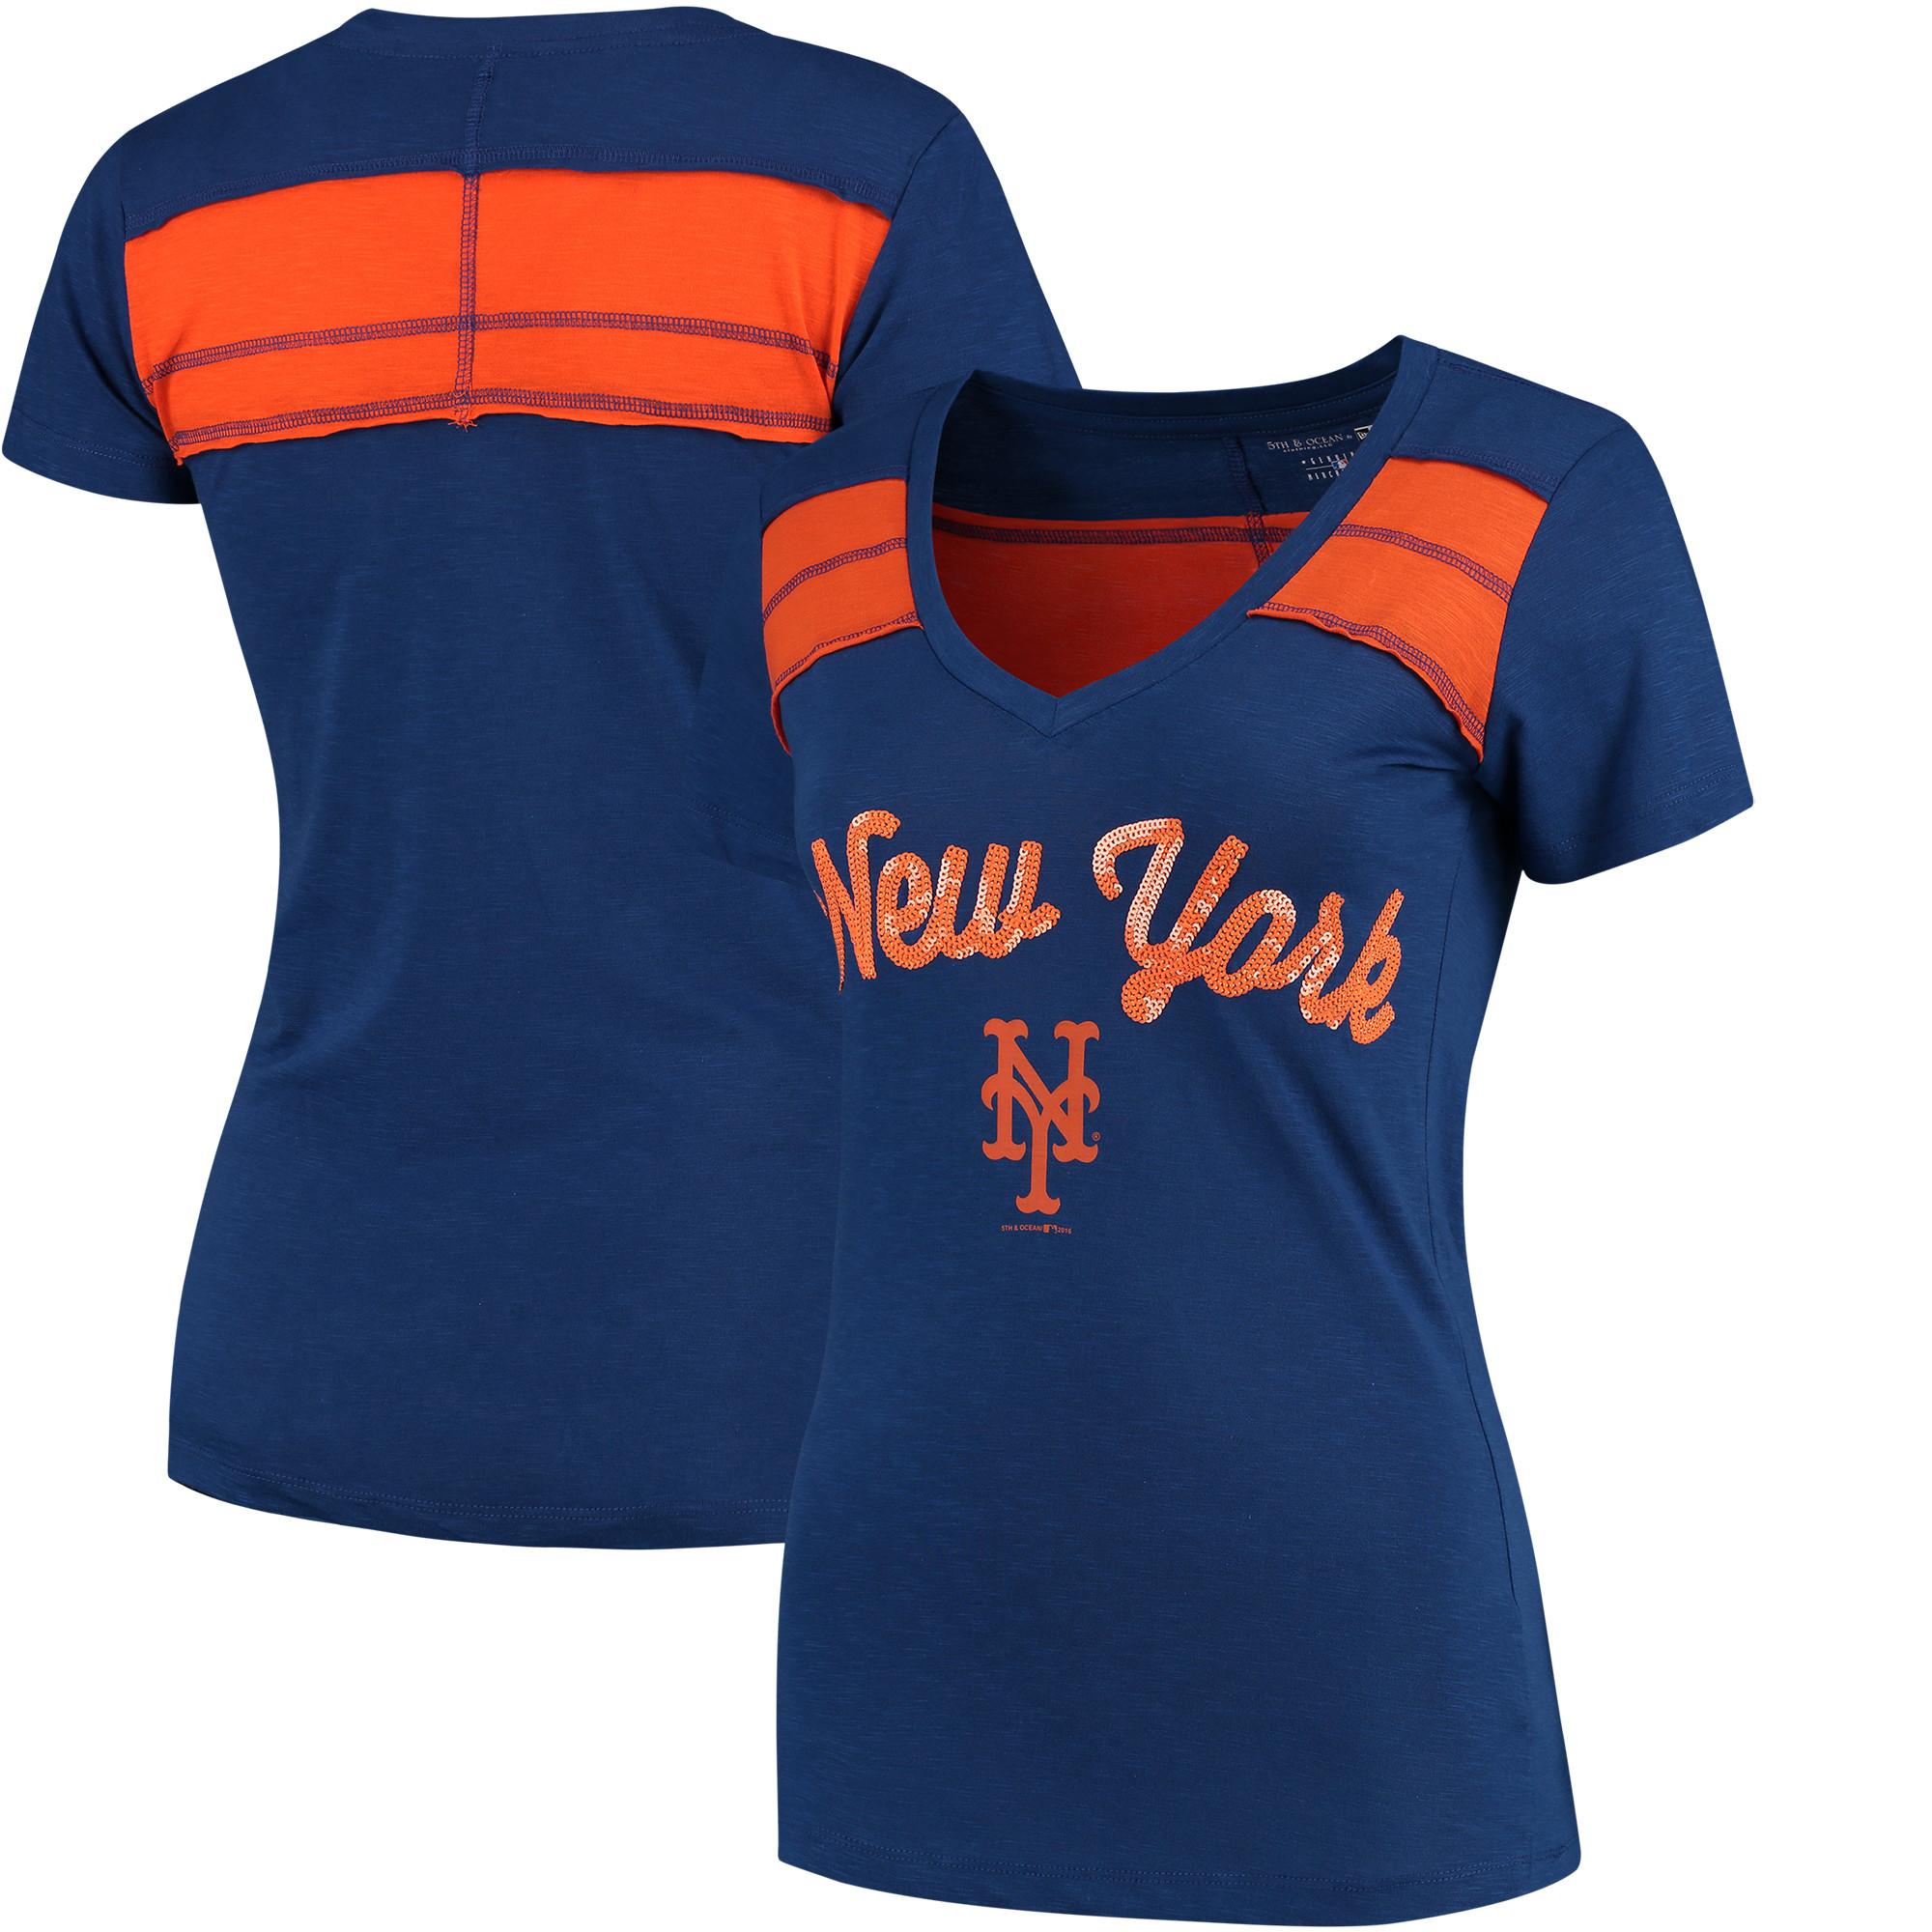 New York Mets 5th & Ocean by New Era Women's MLB Slub V-Neck With Contrast Inserts T-Shirt - Heathered Royal